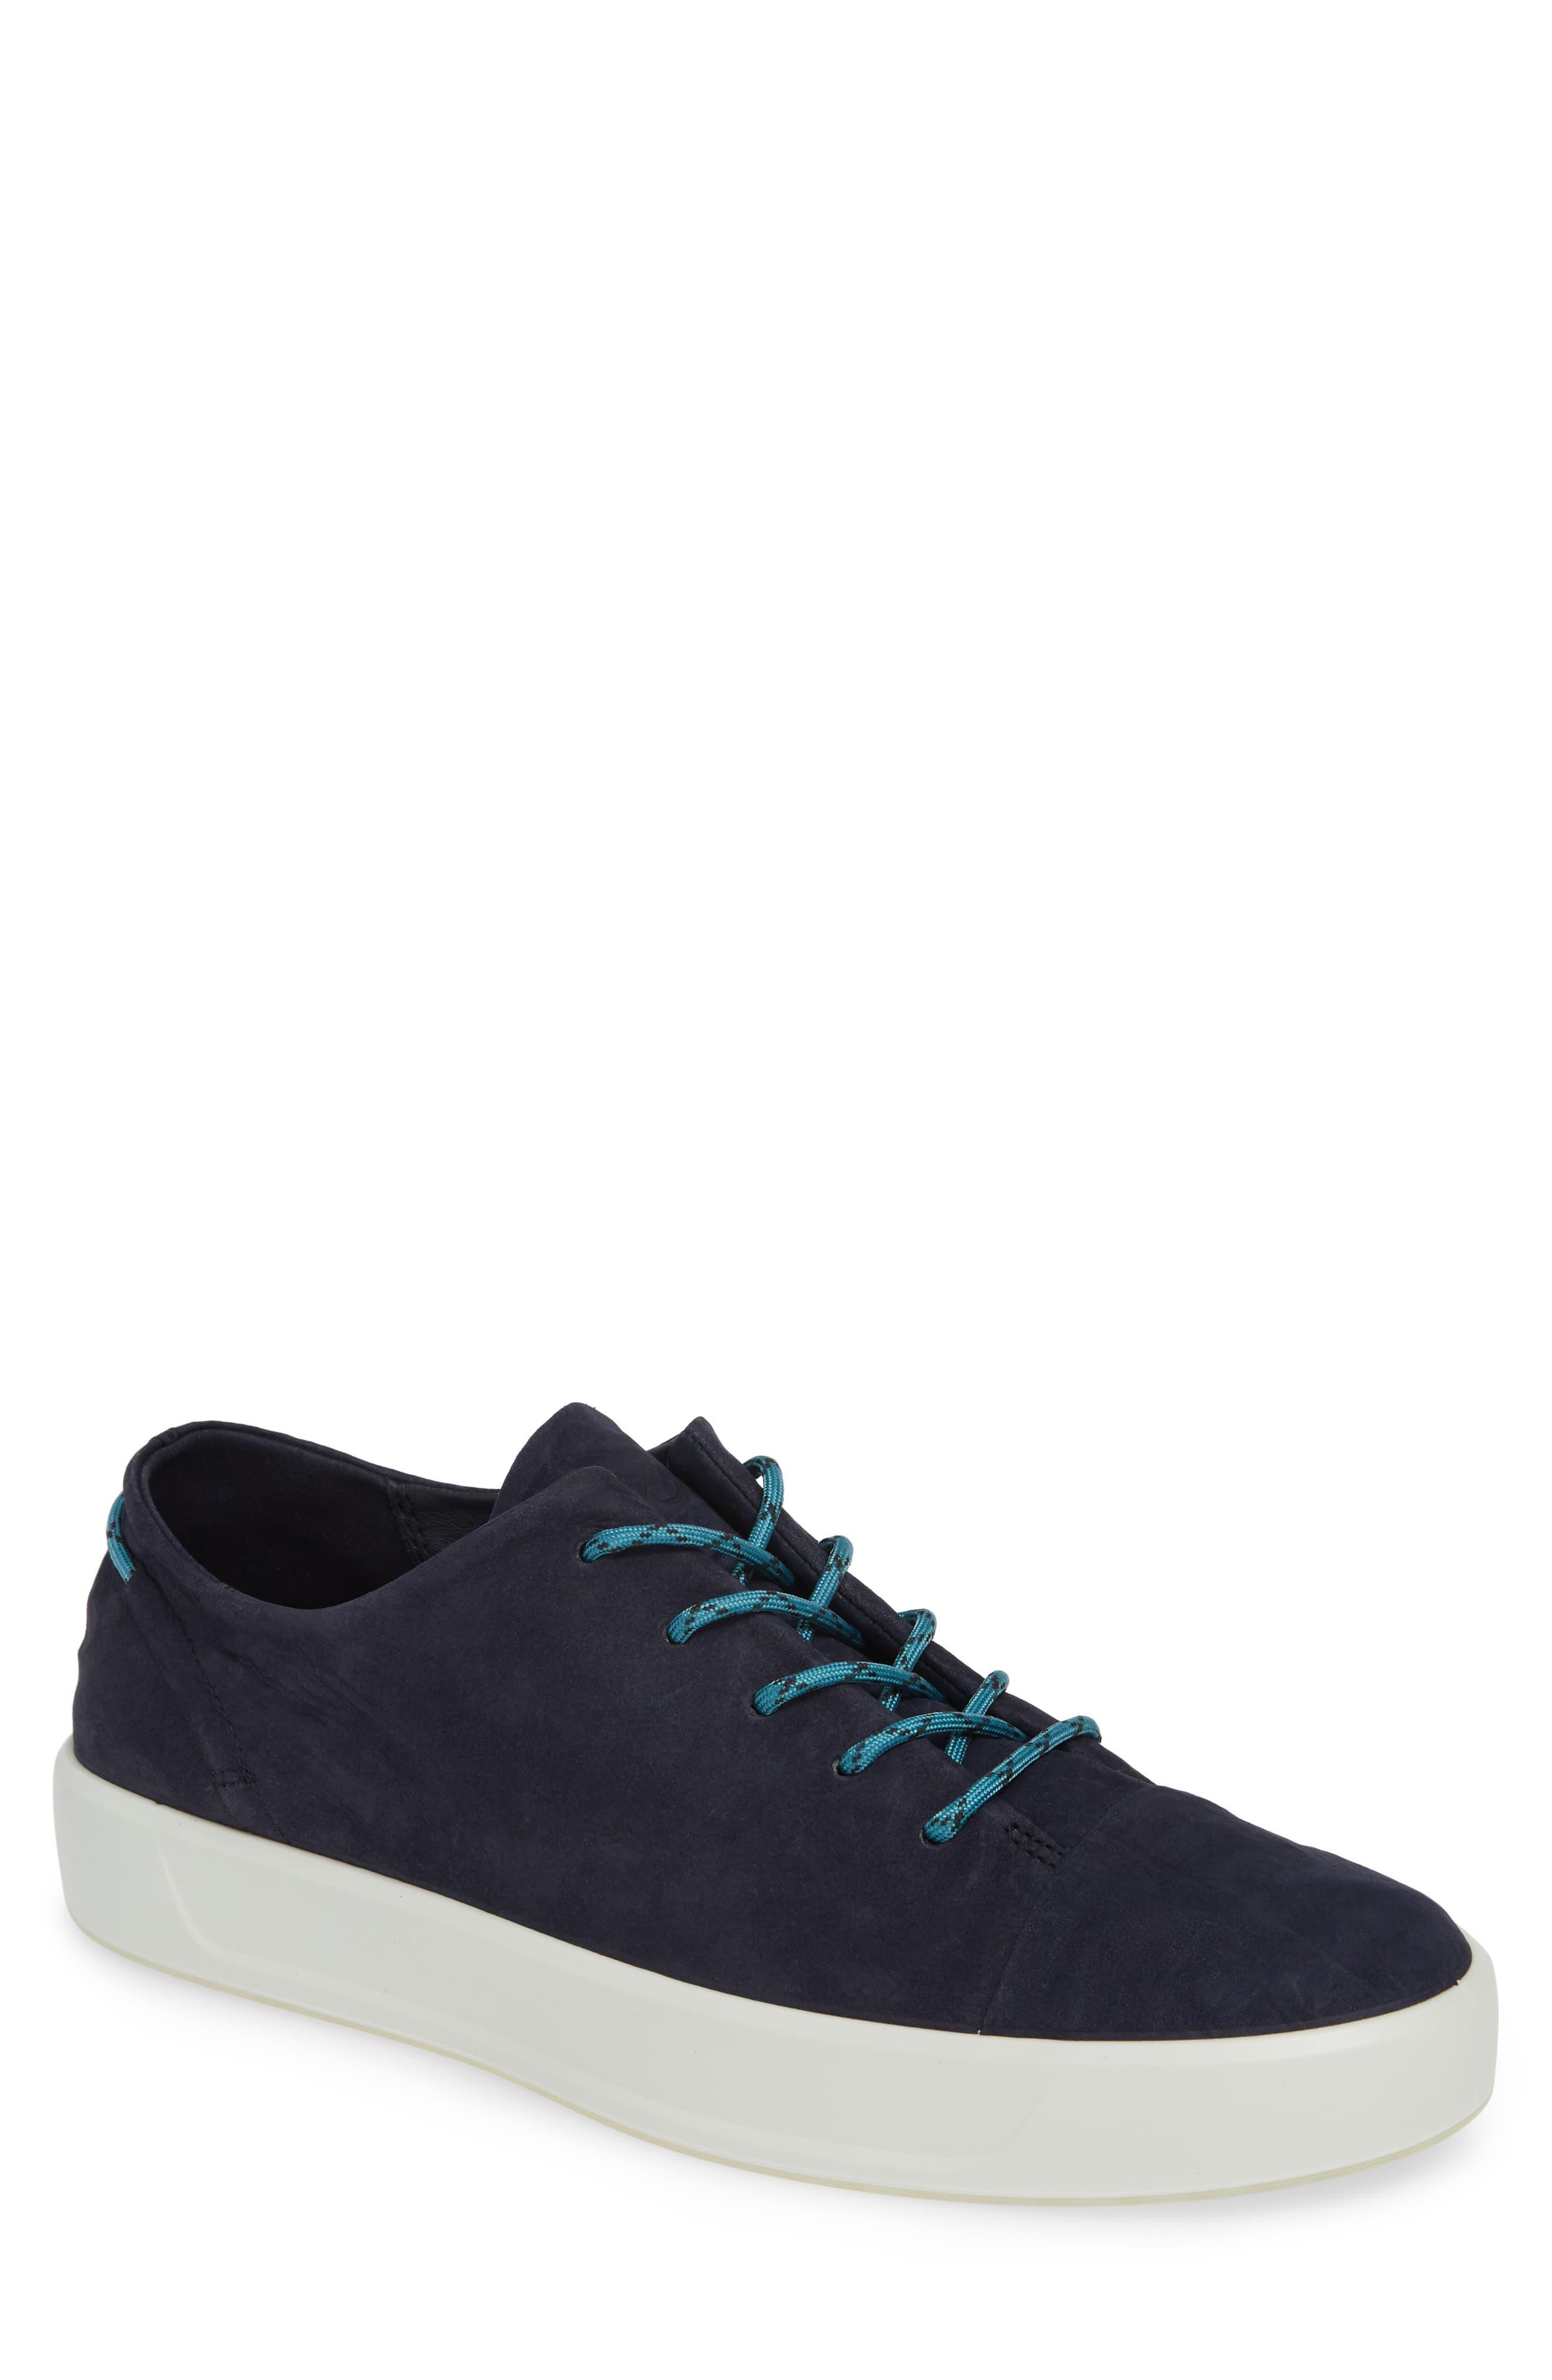 Ecco Soft 8 Dyneema Sneaker - Blue